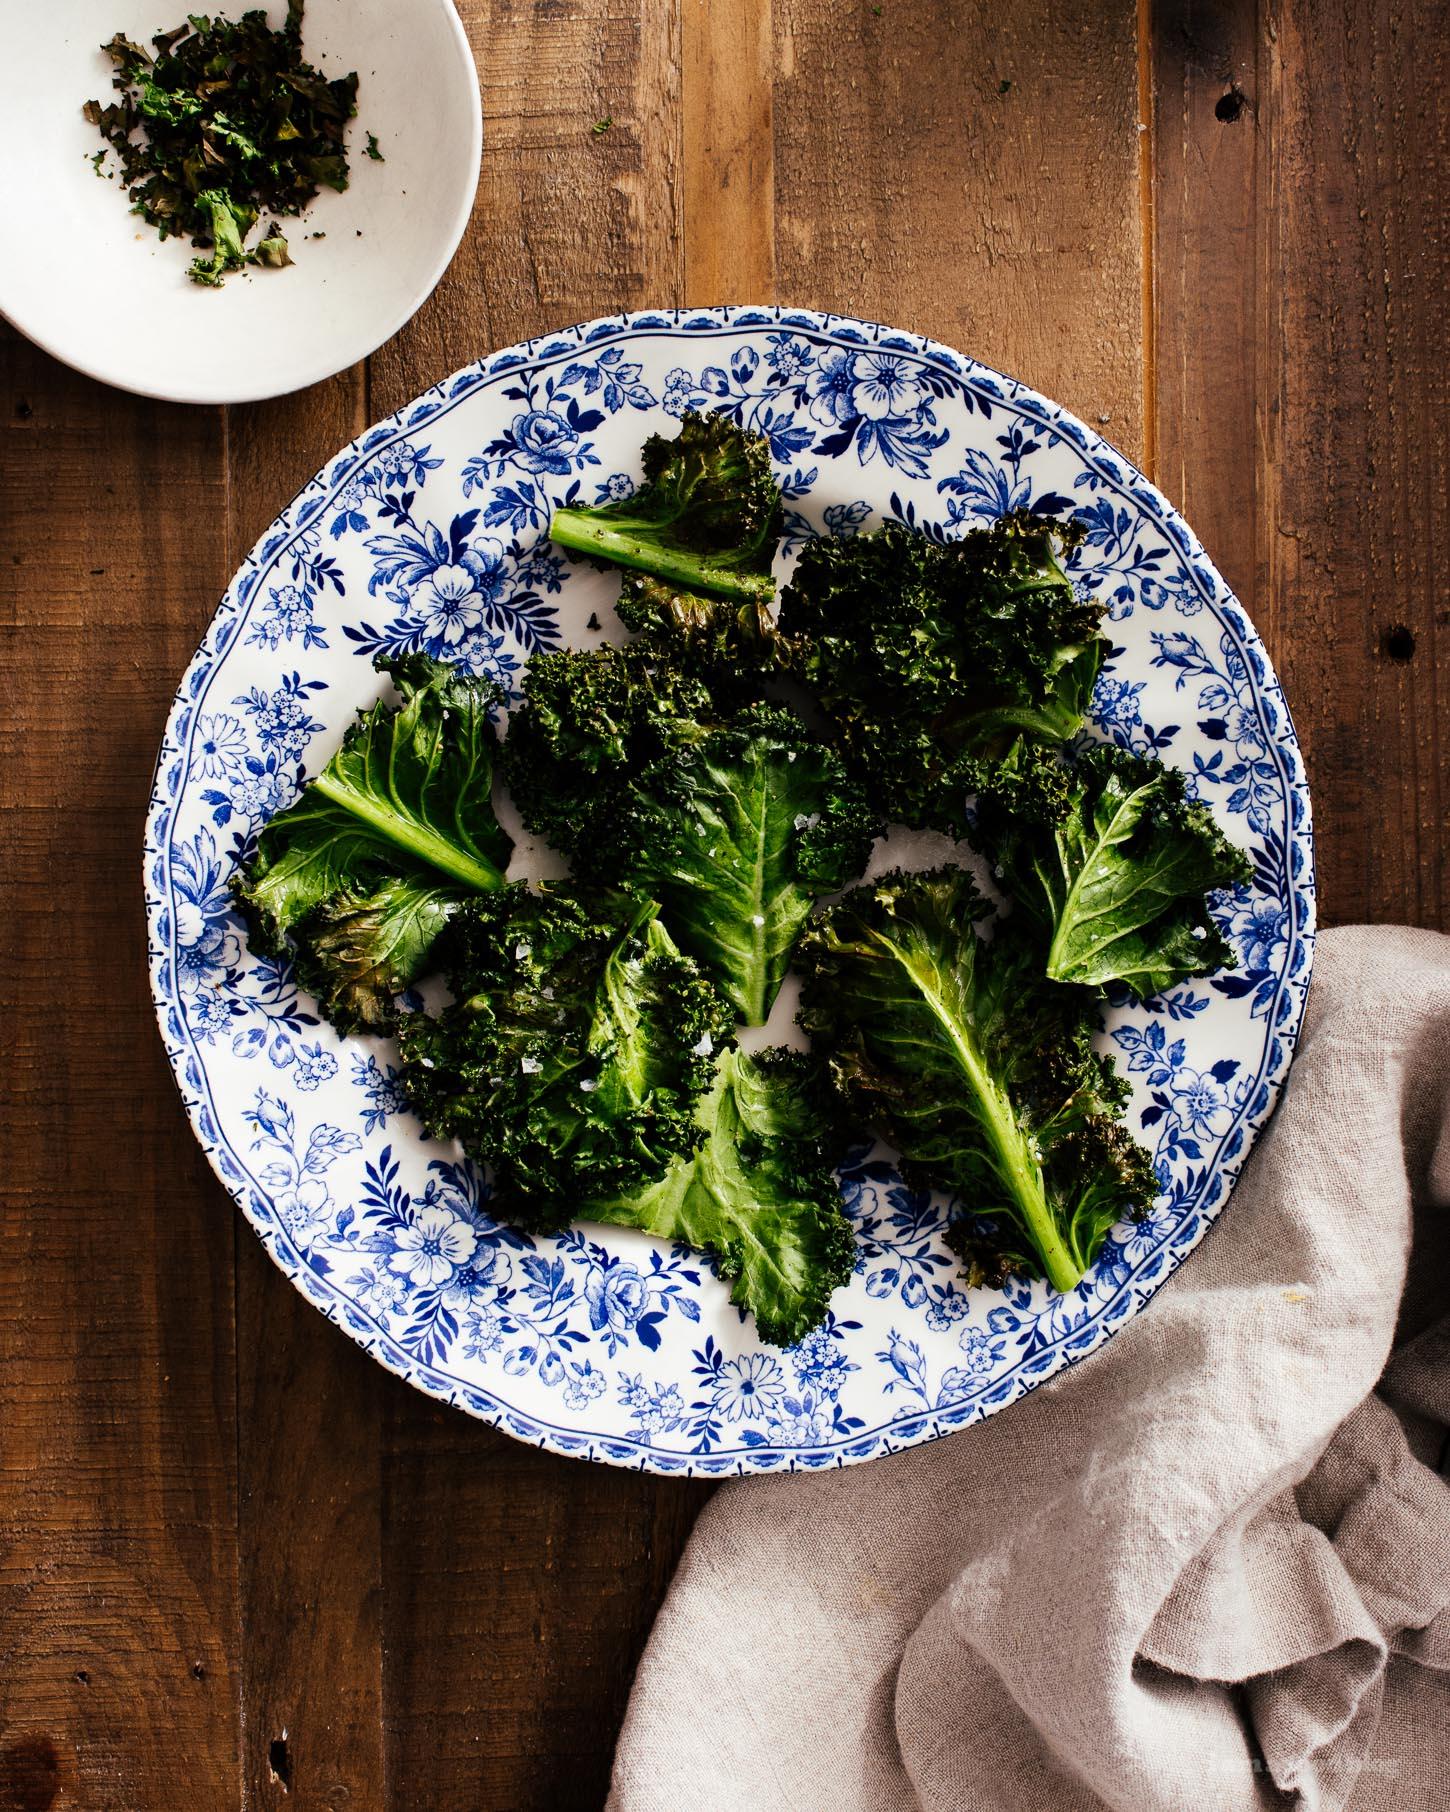 Crispy Air Fryer Kale Chips | www.iamafoodblog.com